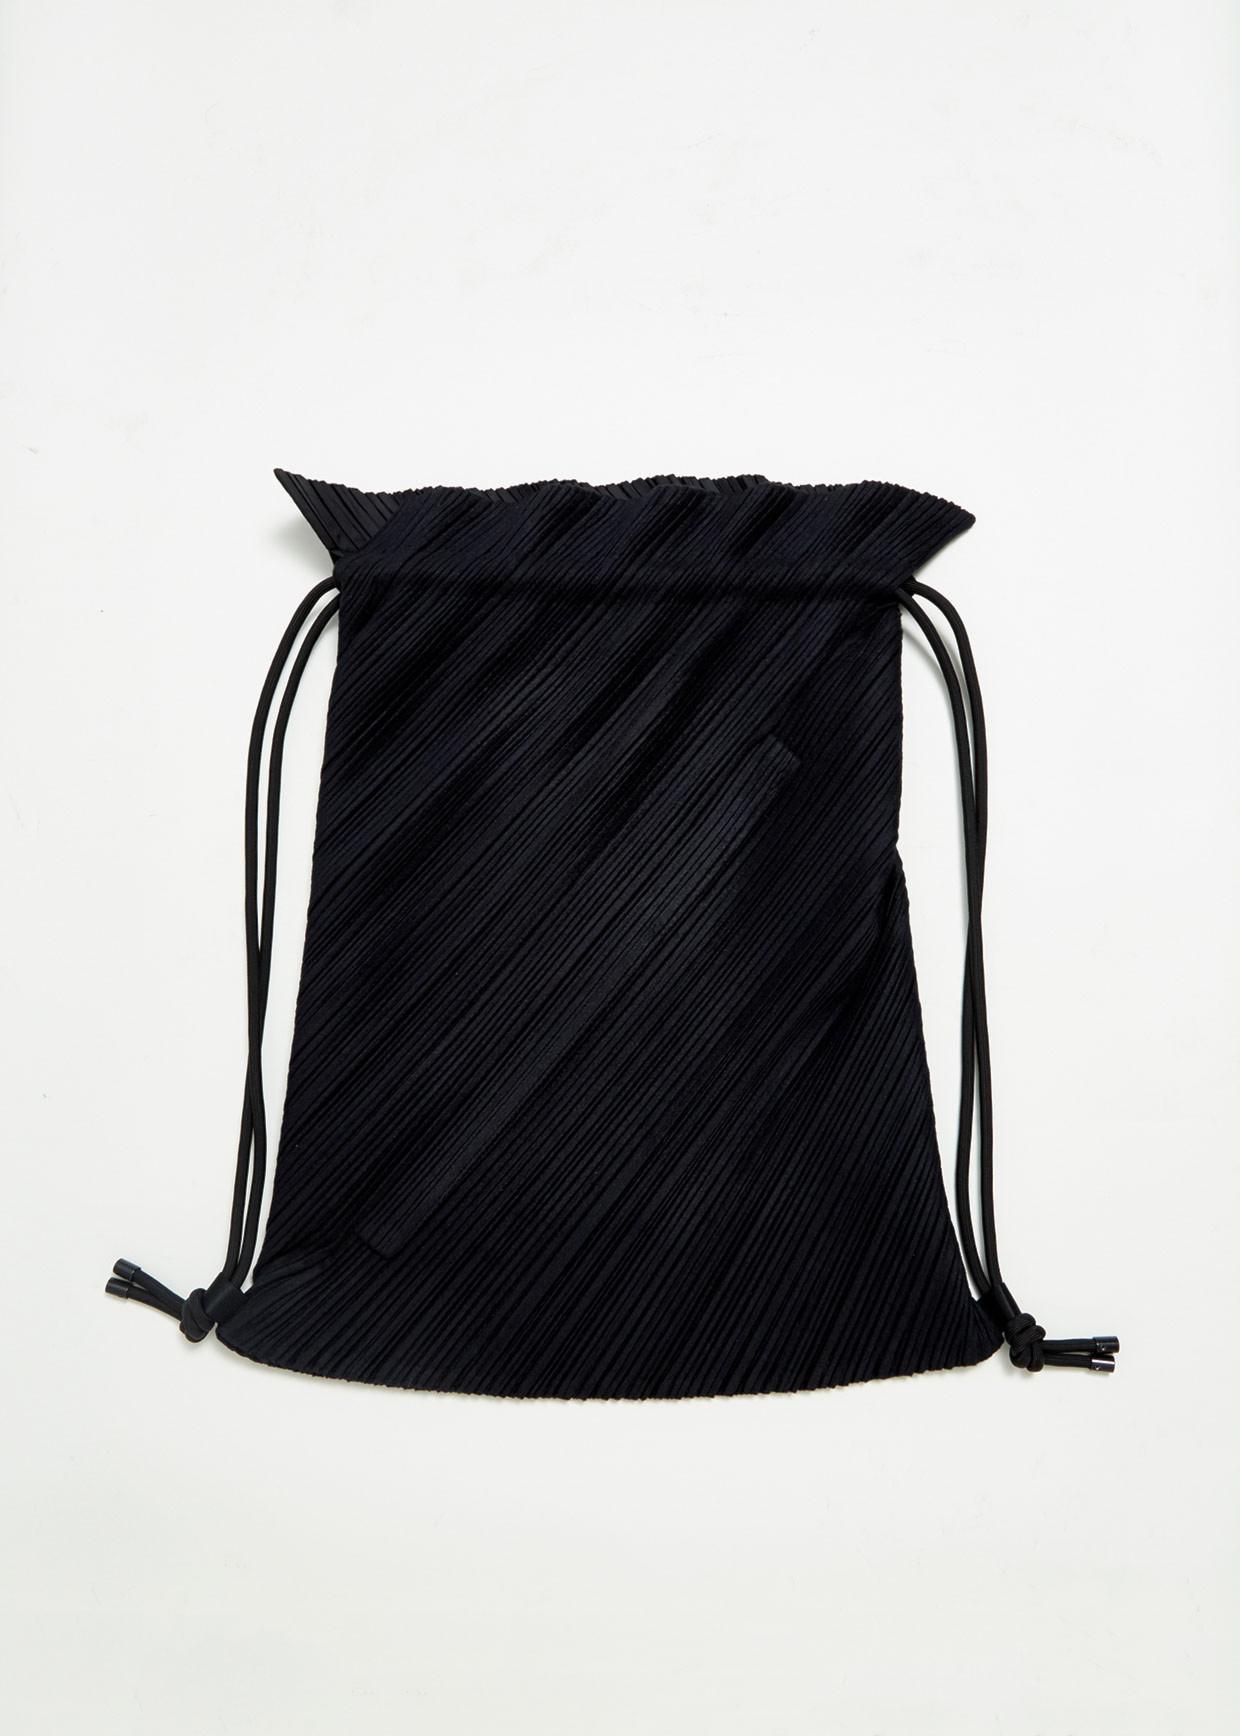 fc0497d526 Pleats Please Issey Miyake Drawstring Pleats Bag in Black - Lyst